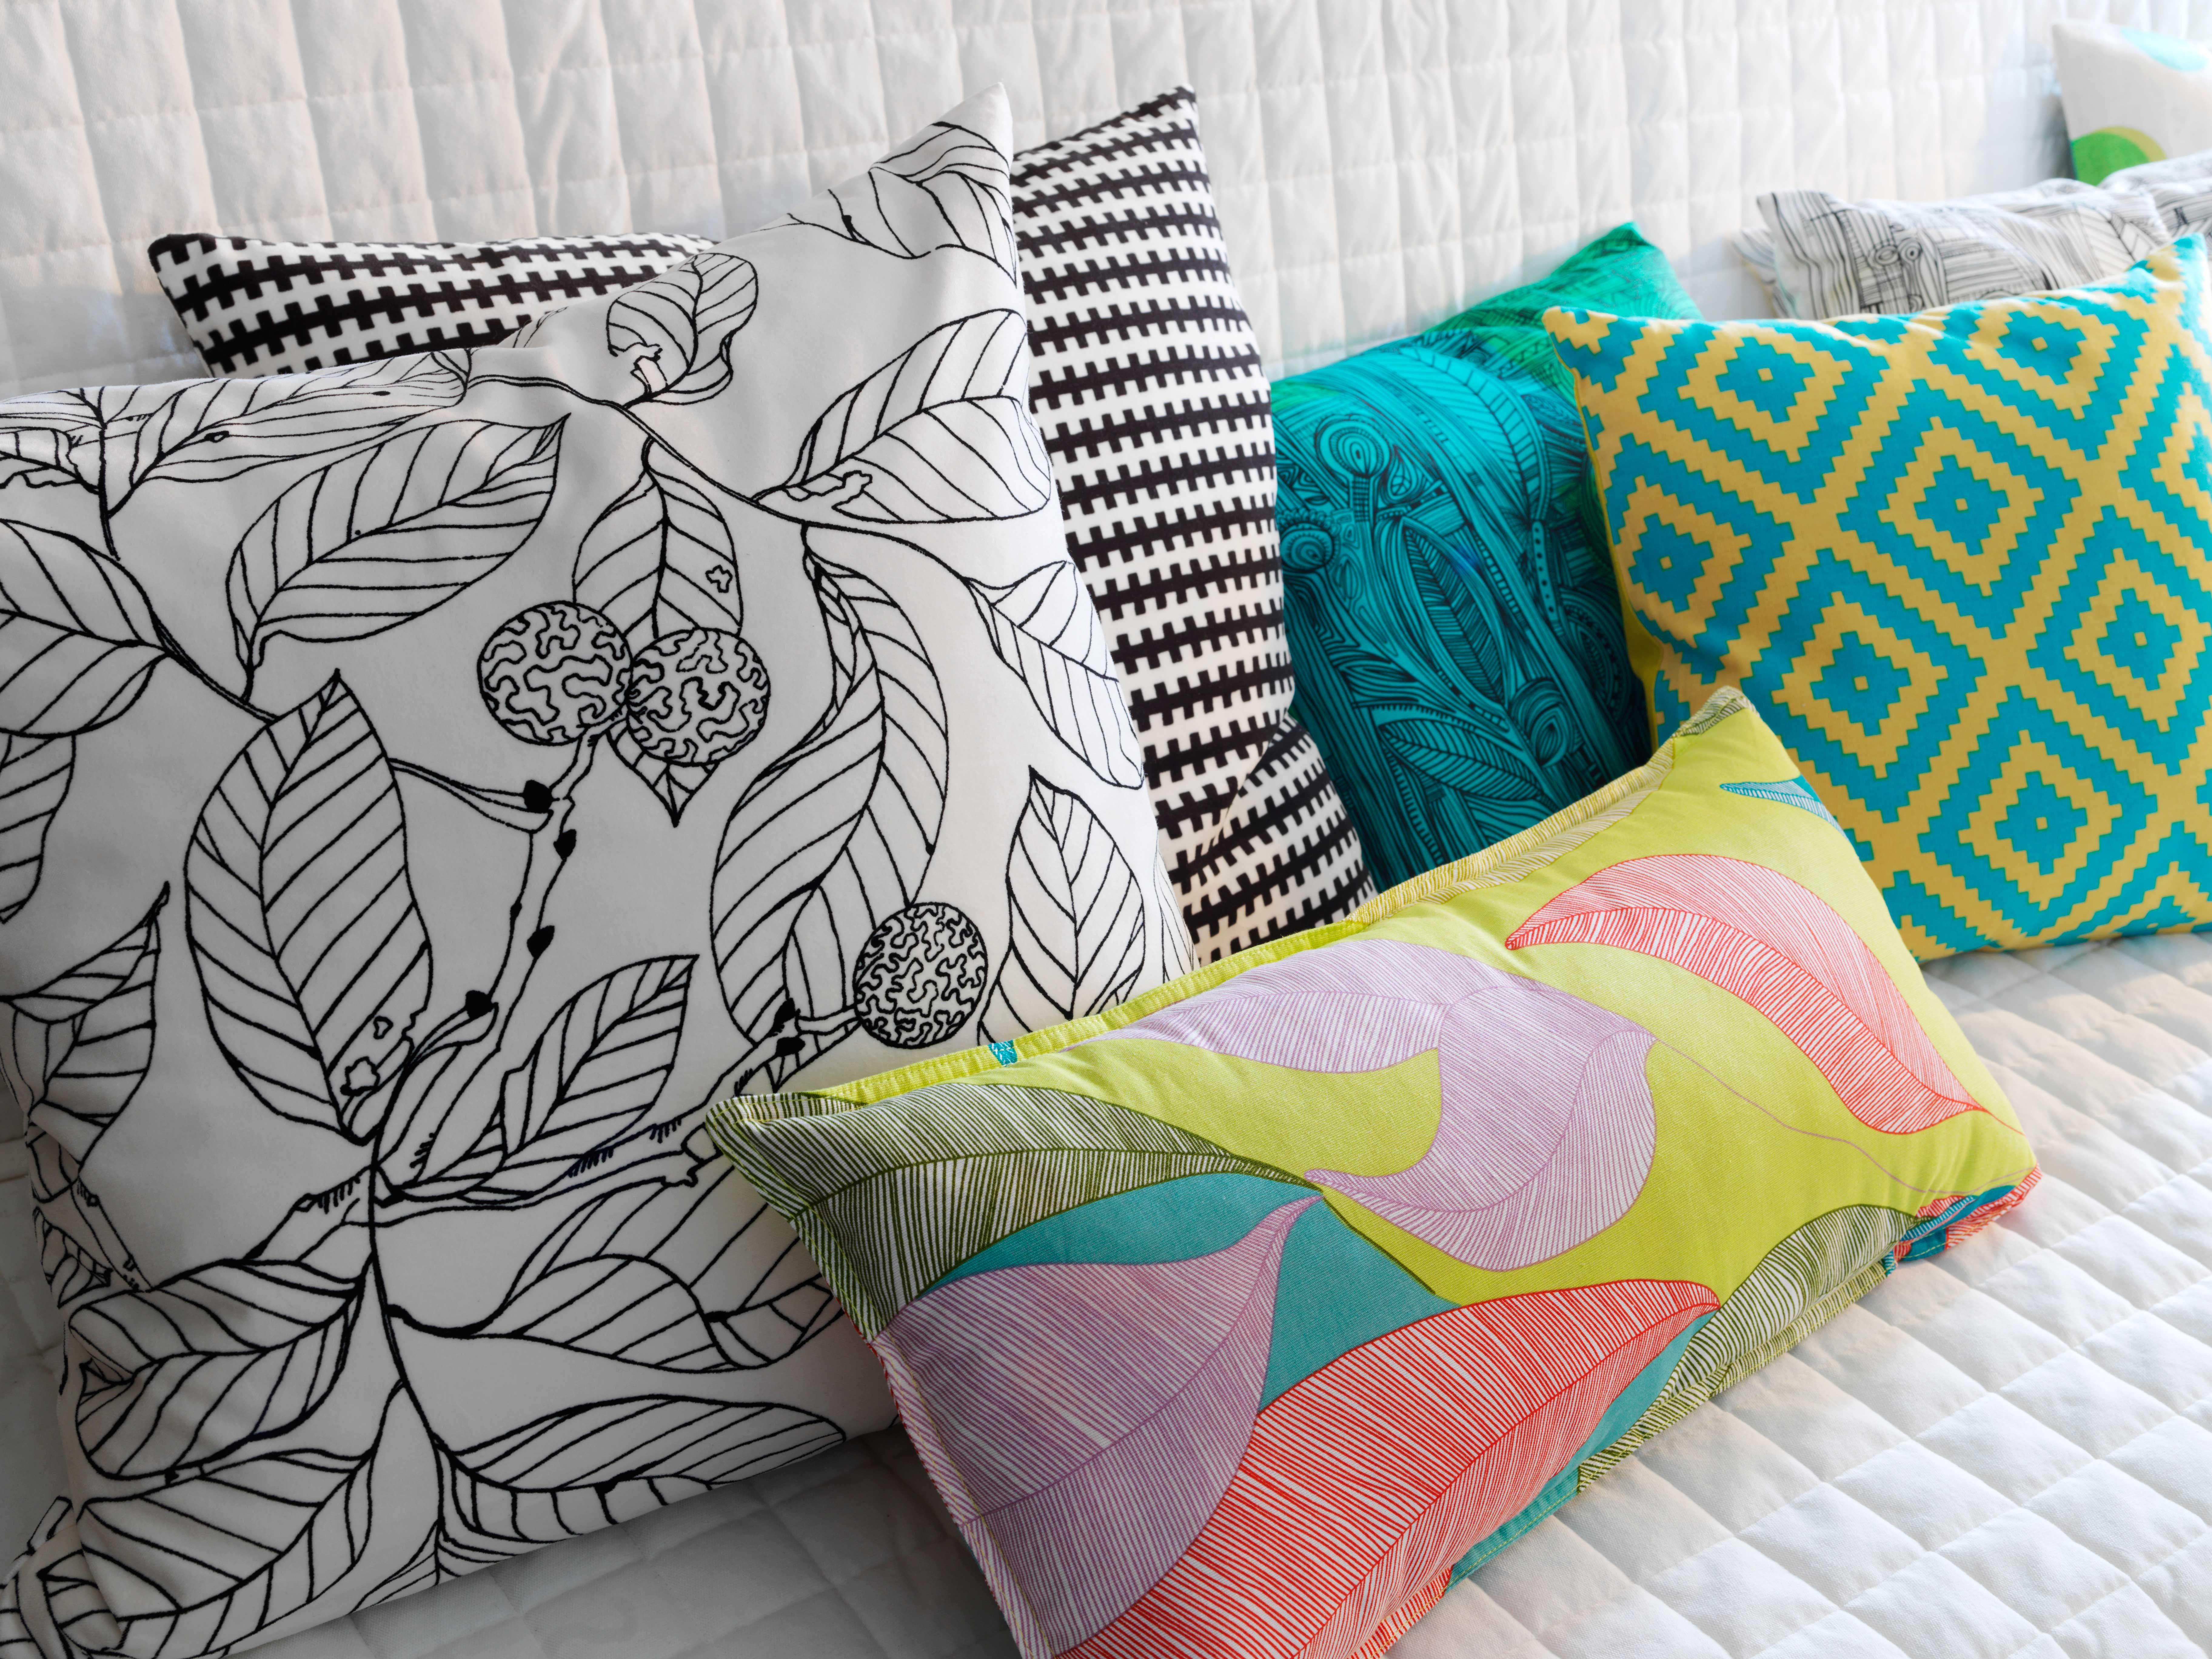 ikea sterreich inspiration textilien kissen malin l v kissen eivor kissen ikea stockholm. Black Bedroom Furniture Sets. Home Design Ideas